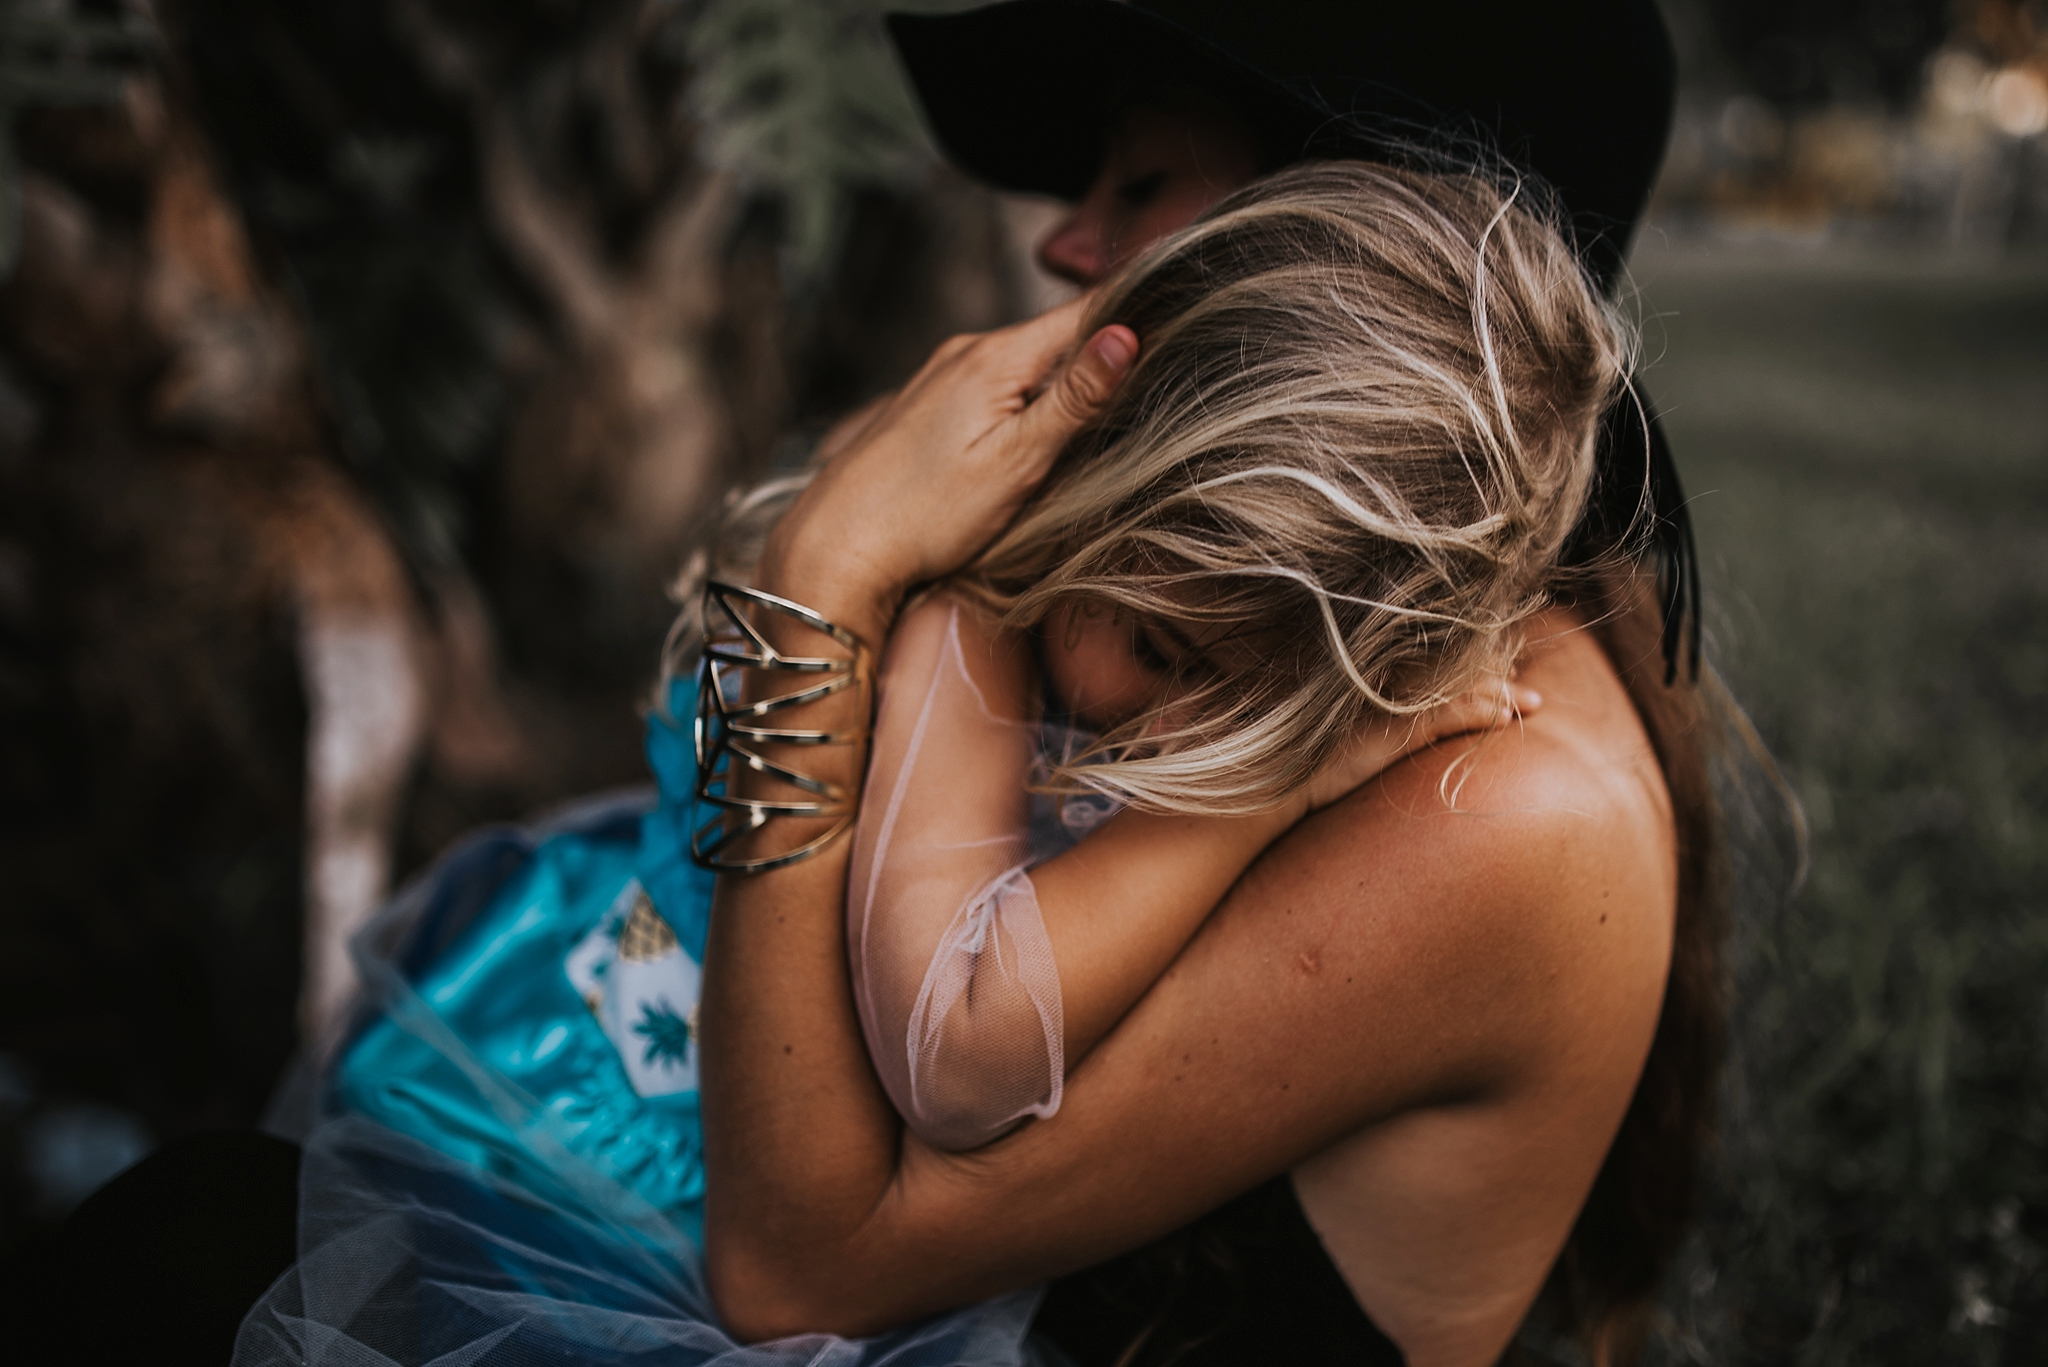 twyla jones photography - treasure coast - florida family photography riverbend park jupiter florida-6222.jpg